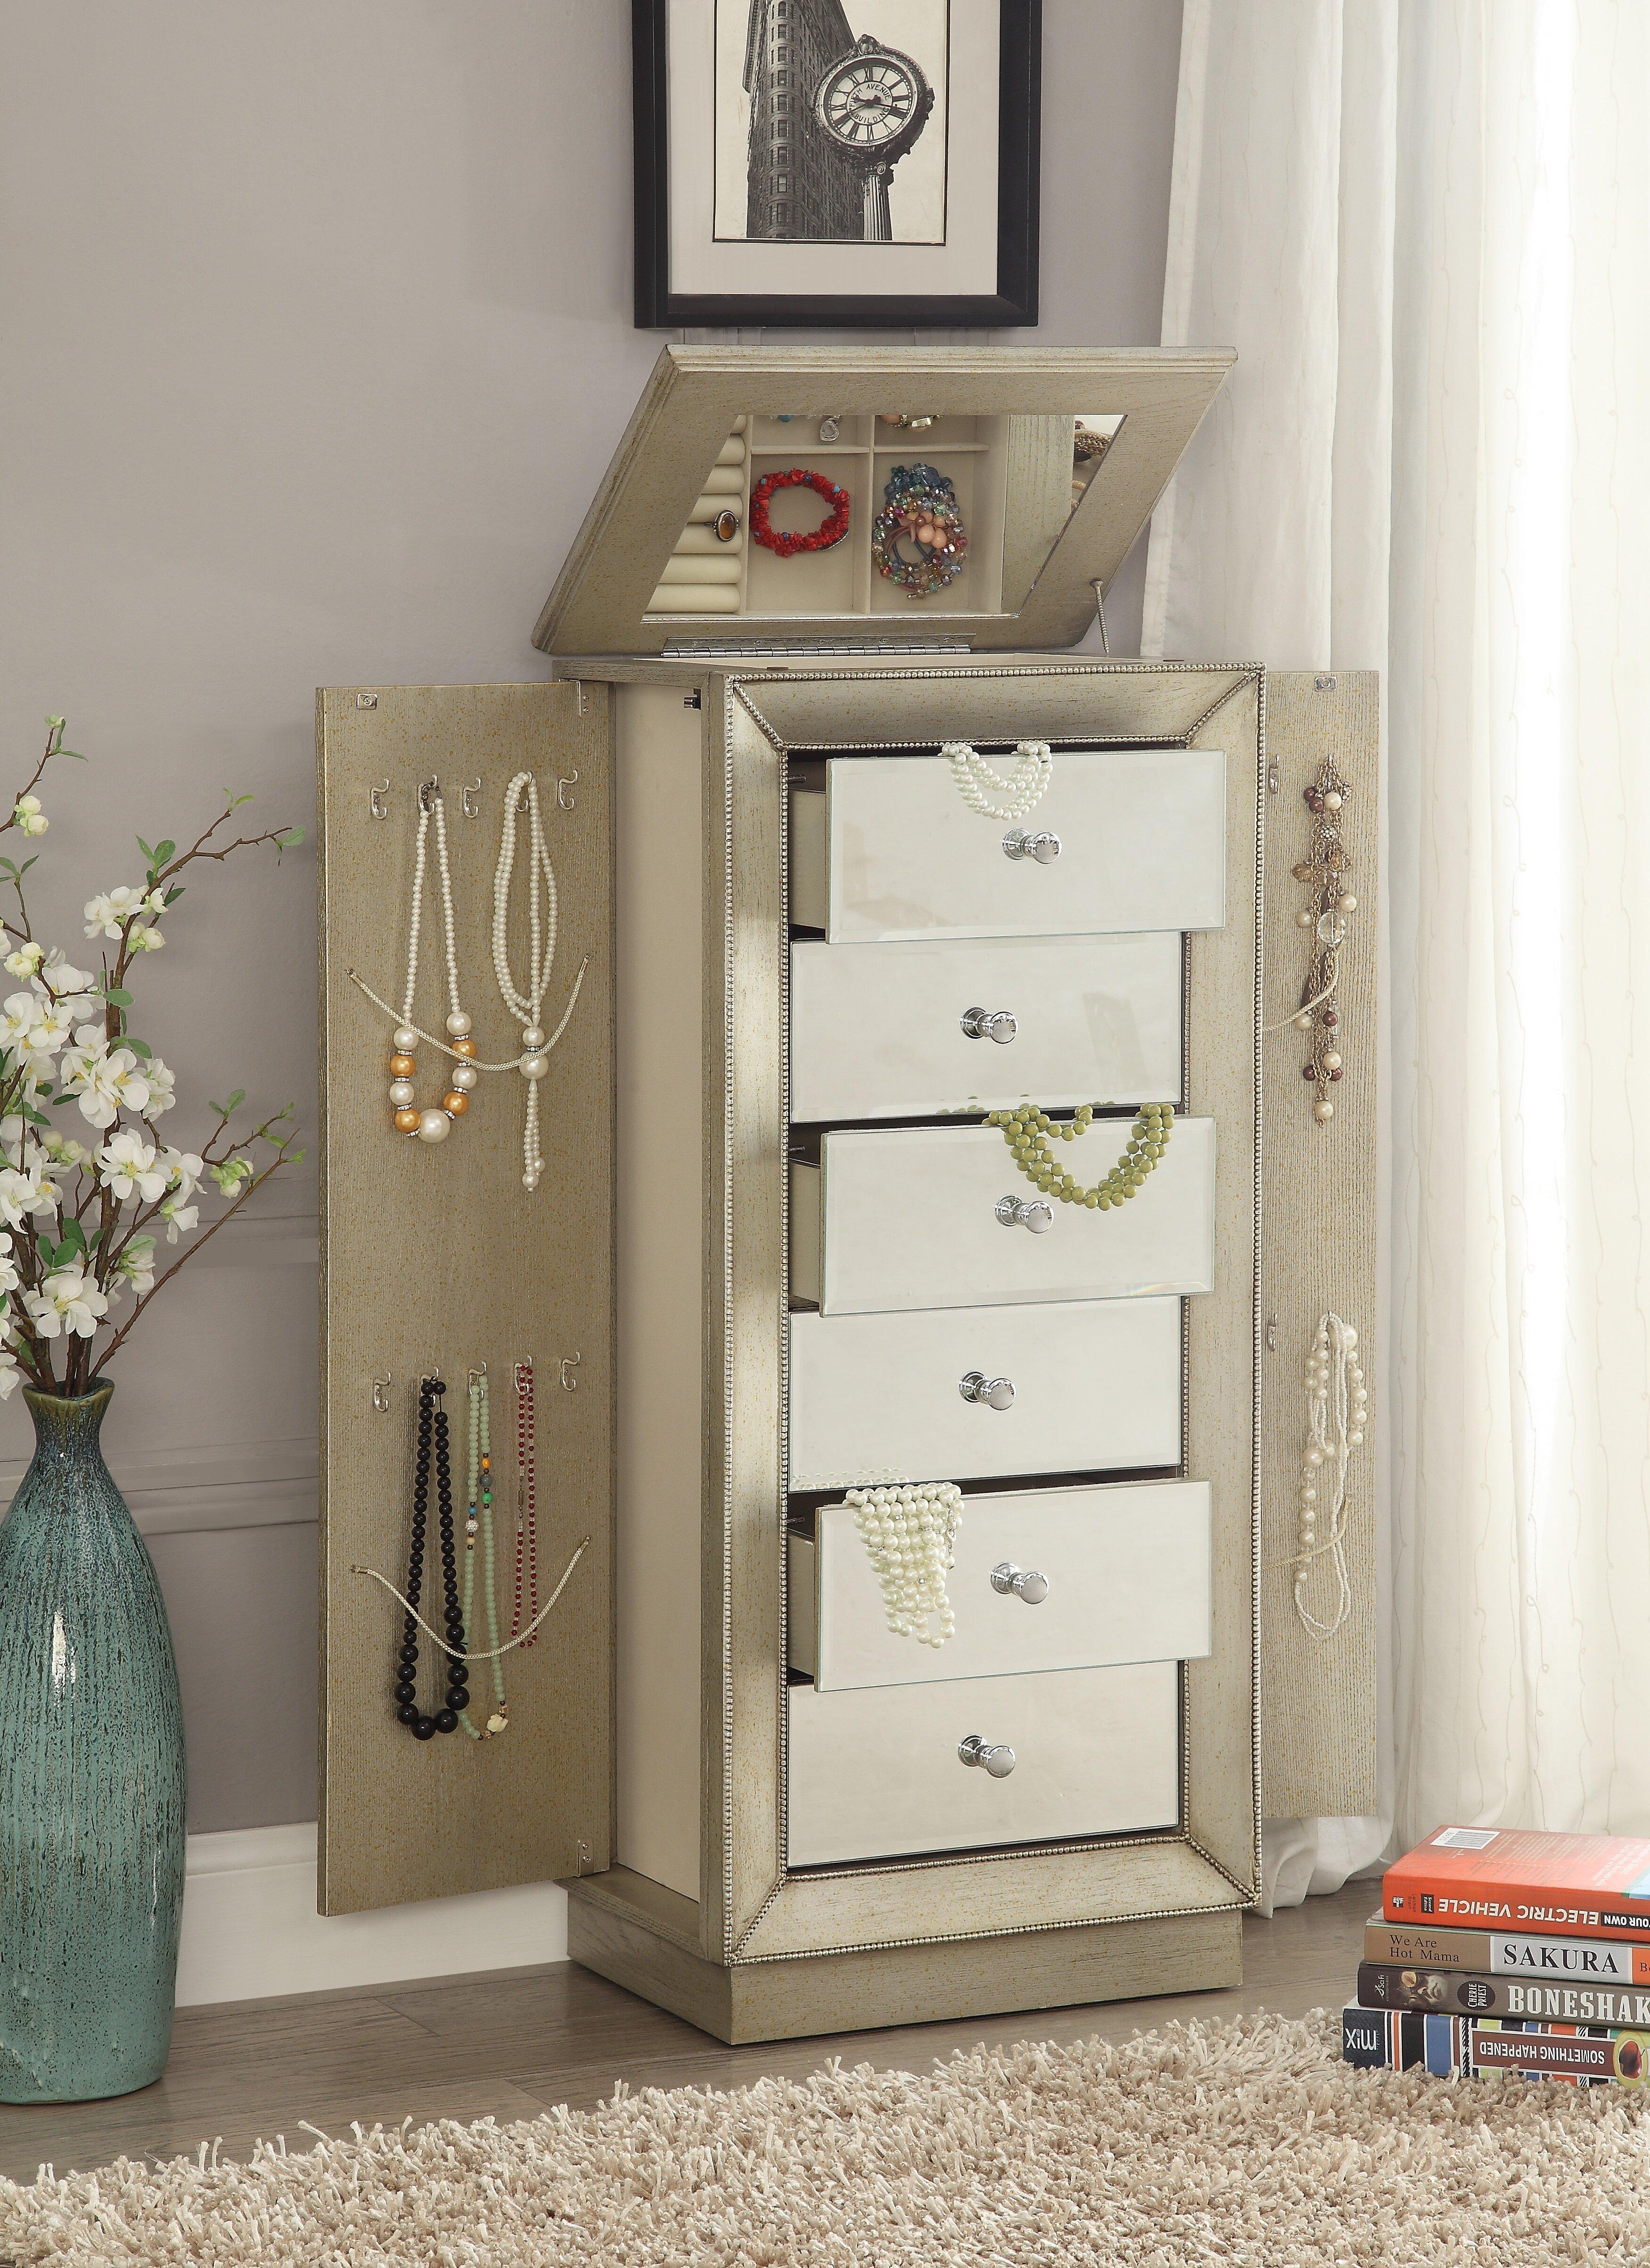 home ideas vanity jewelry of closet up my drawer systems closets drawers cheap alex walmart ikea organizer acrylic make